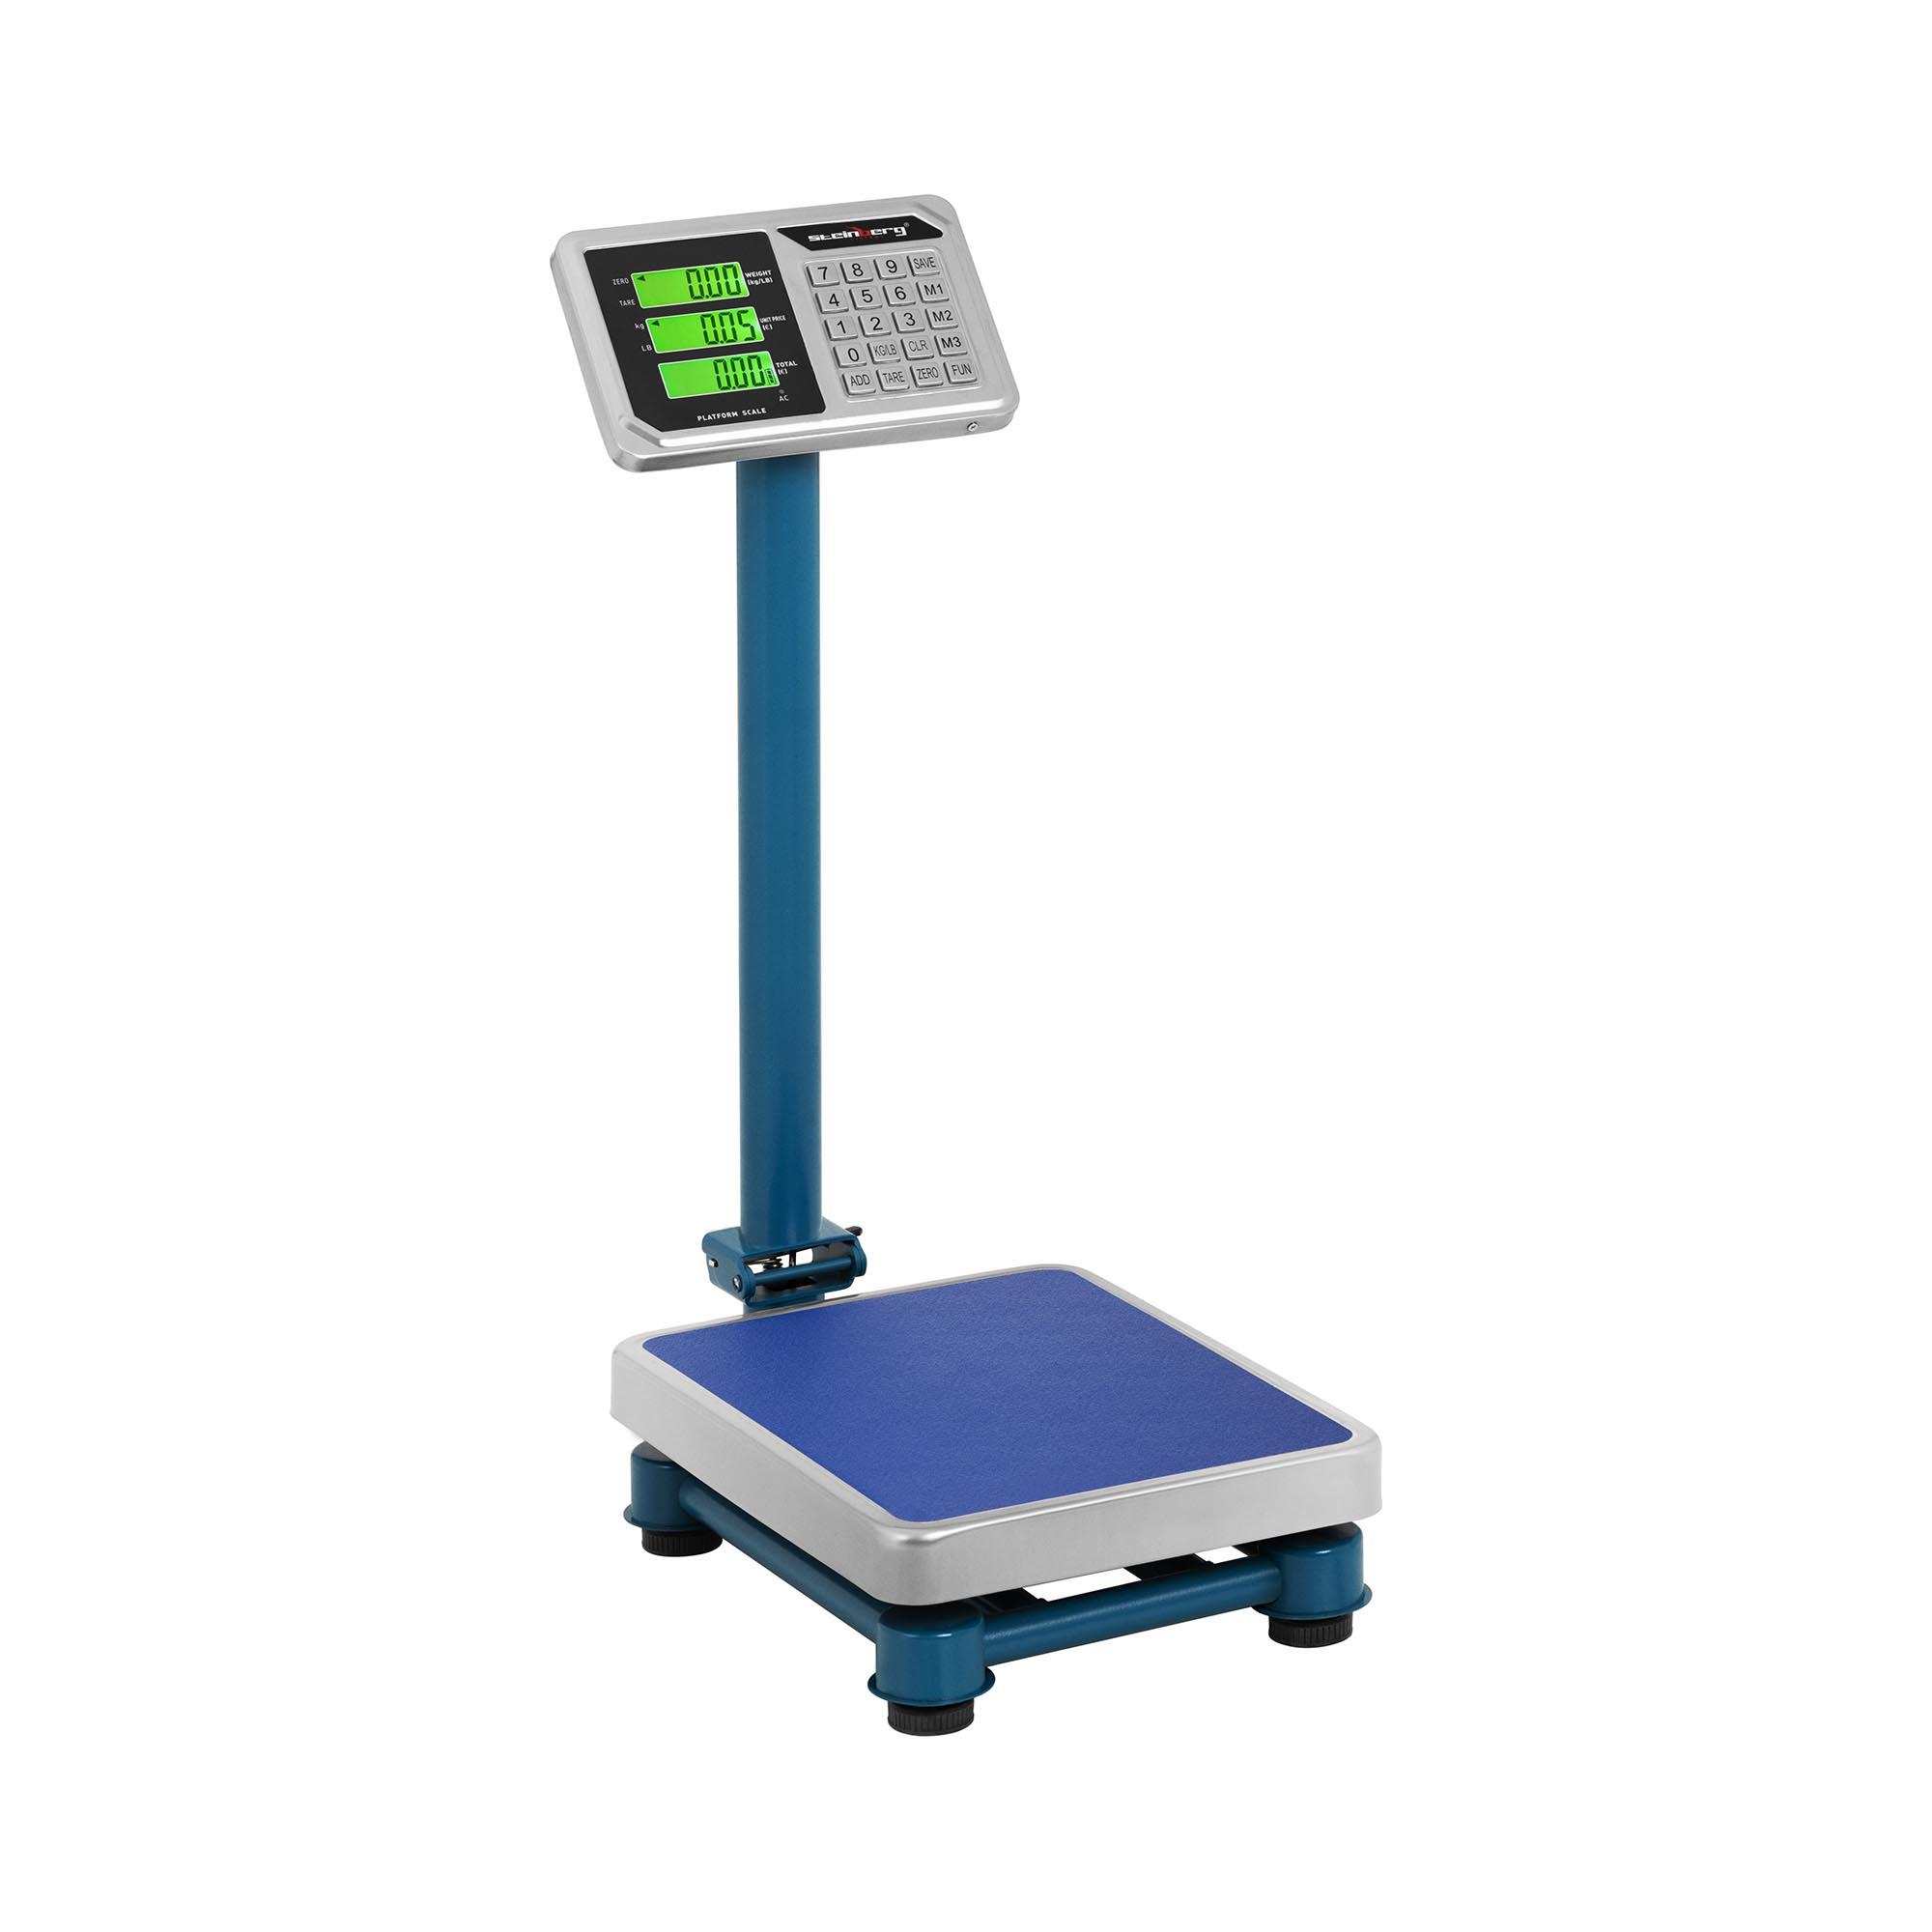 Steinberg Systems Plattformwaage - 100 kg / 20 g - 40 x 30 cm - LCD - Edelstahl SBS-PF-100/20C